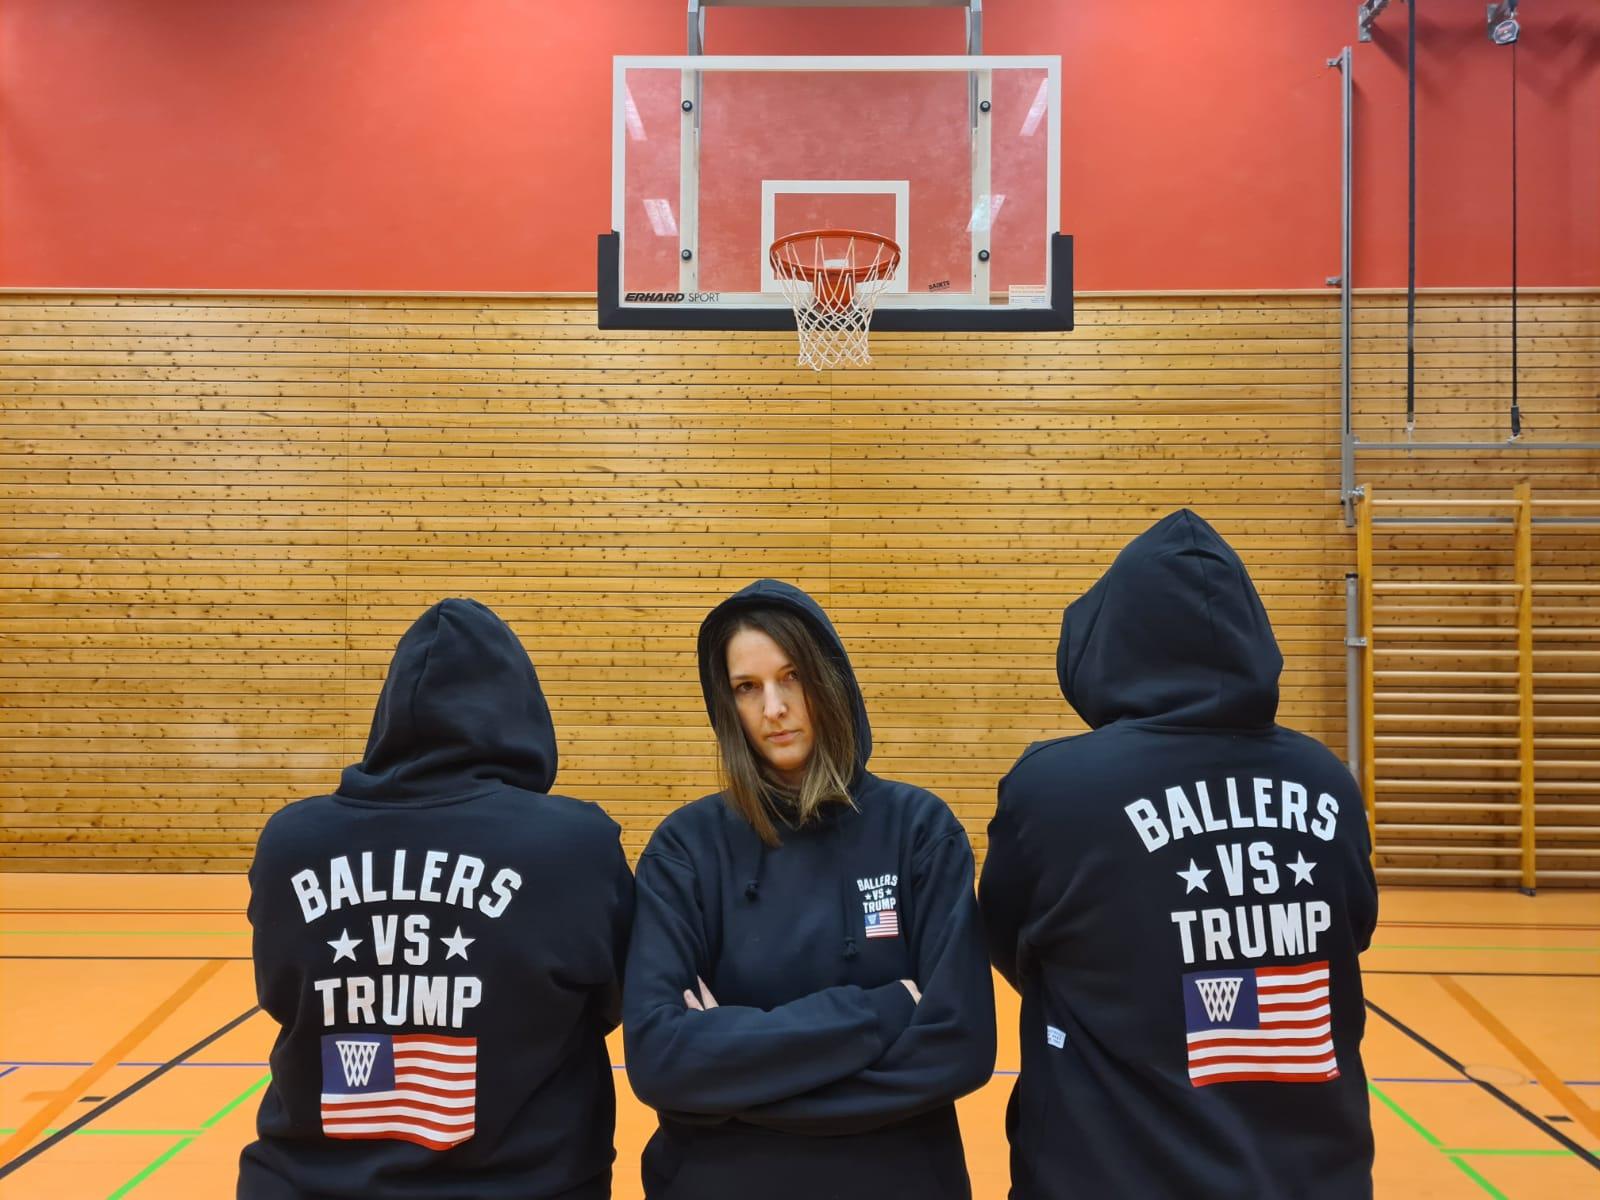 Ballers-vs-Trump